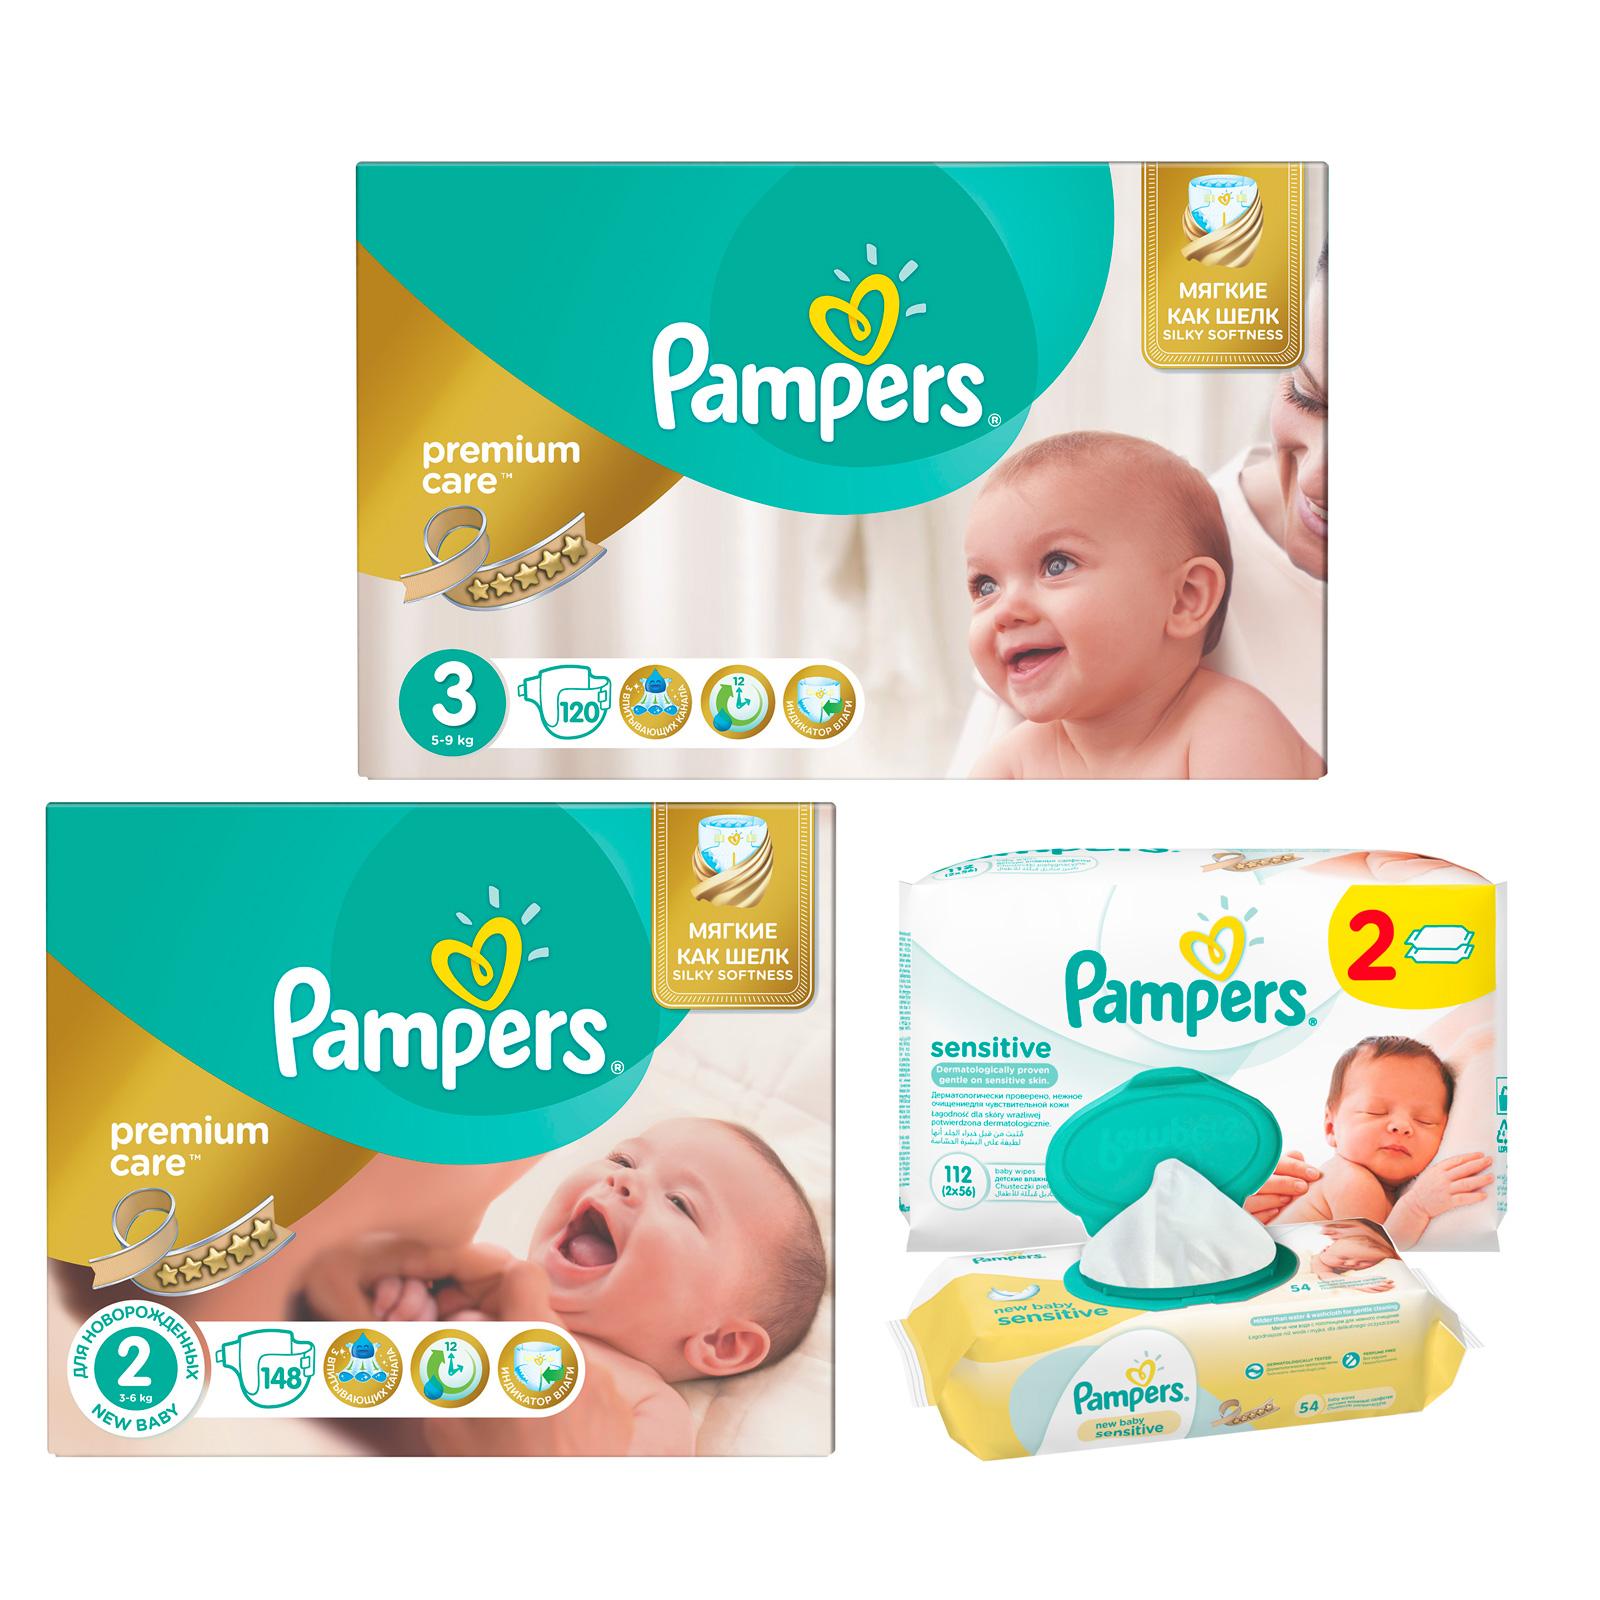 Набор Pampers №4 Подгузники Pampers Premium care 2-3 + салфетки<br>